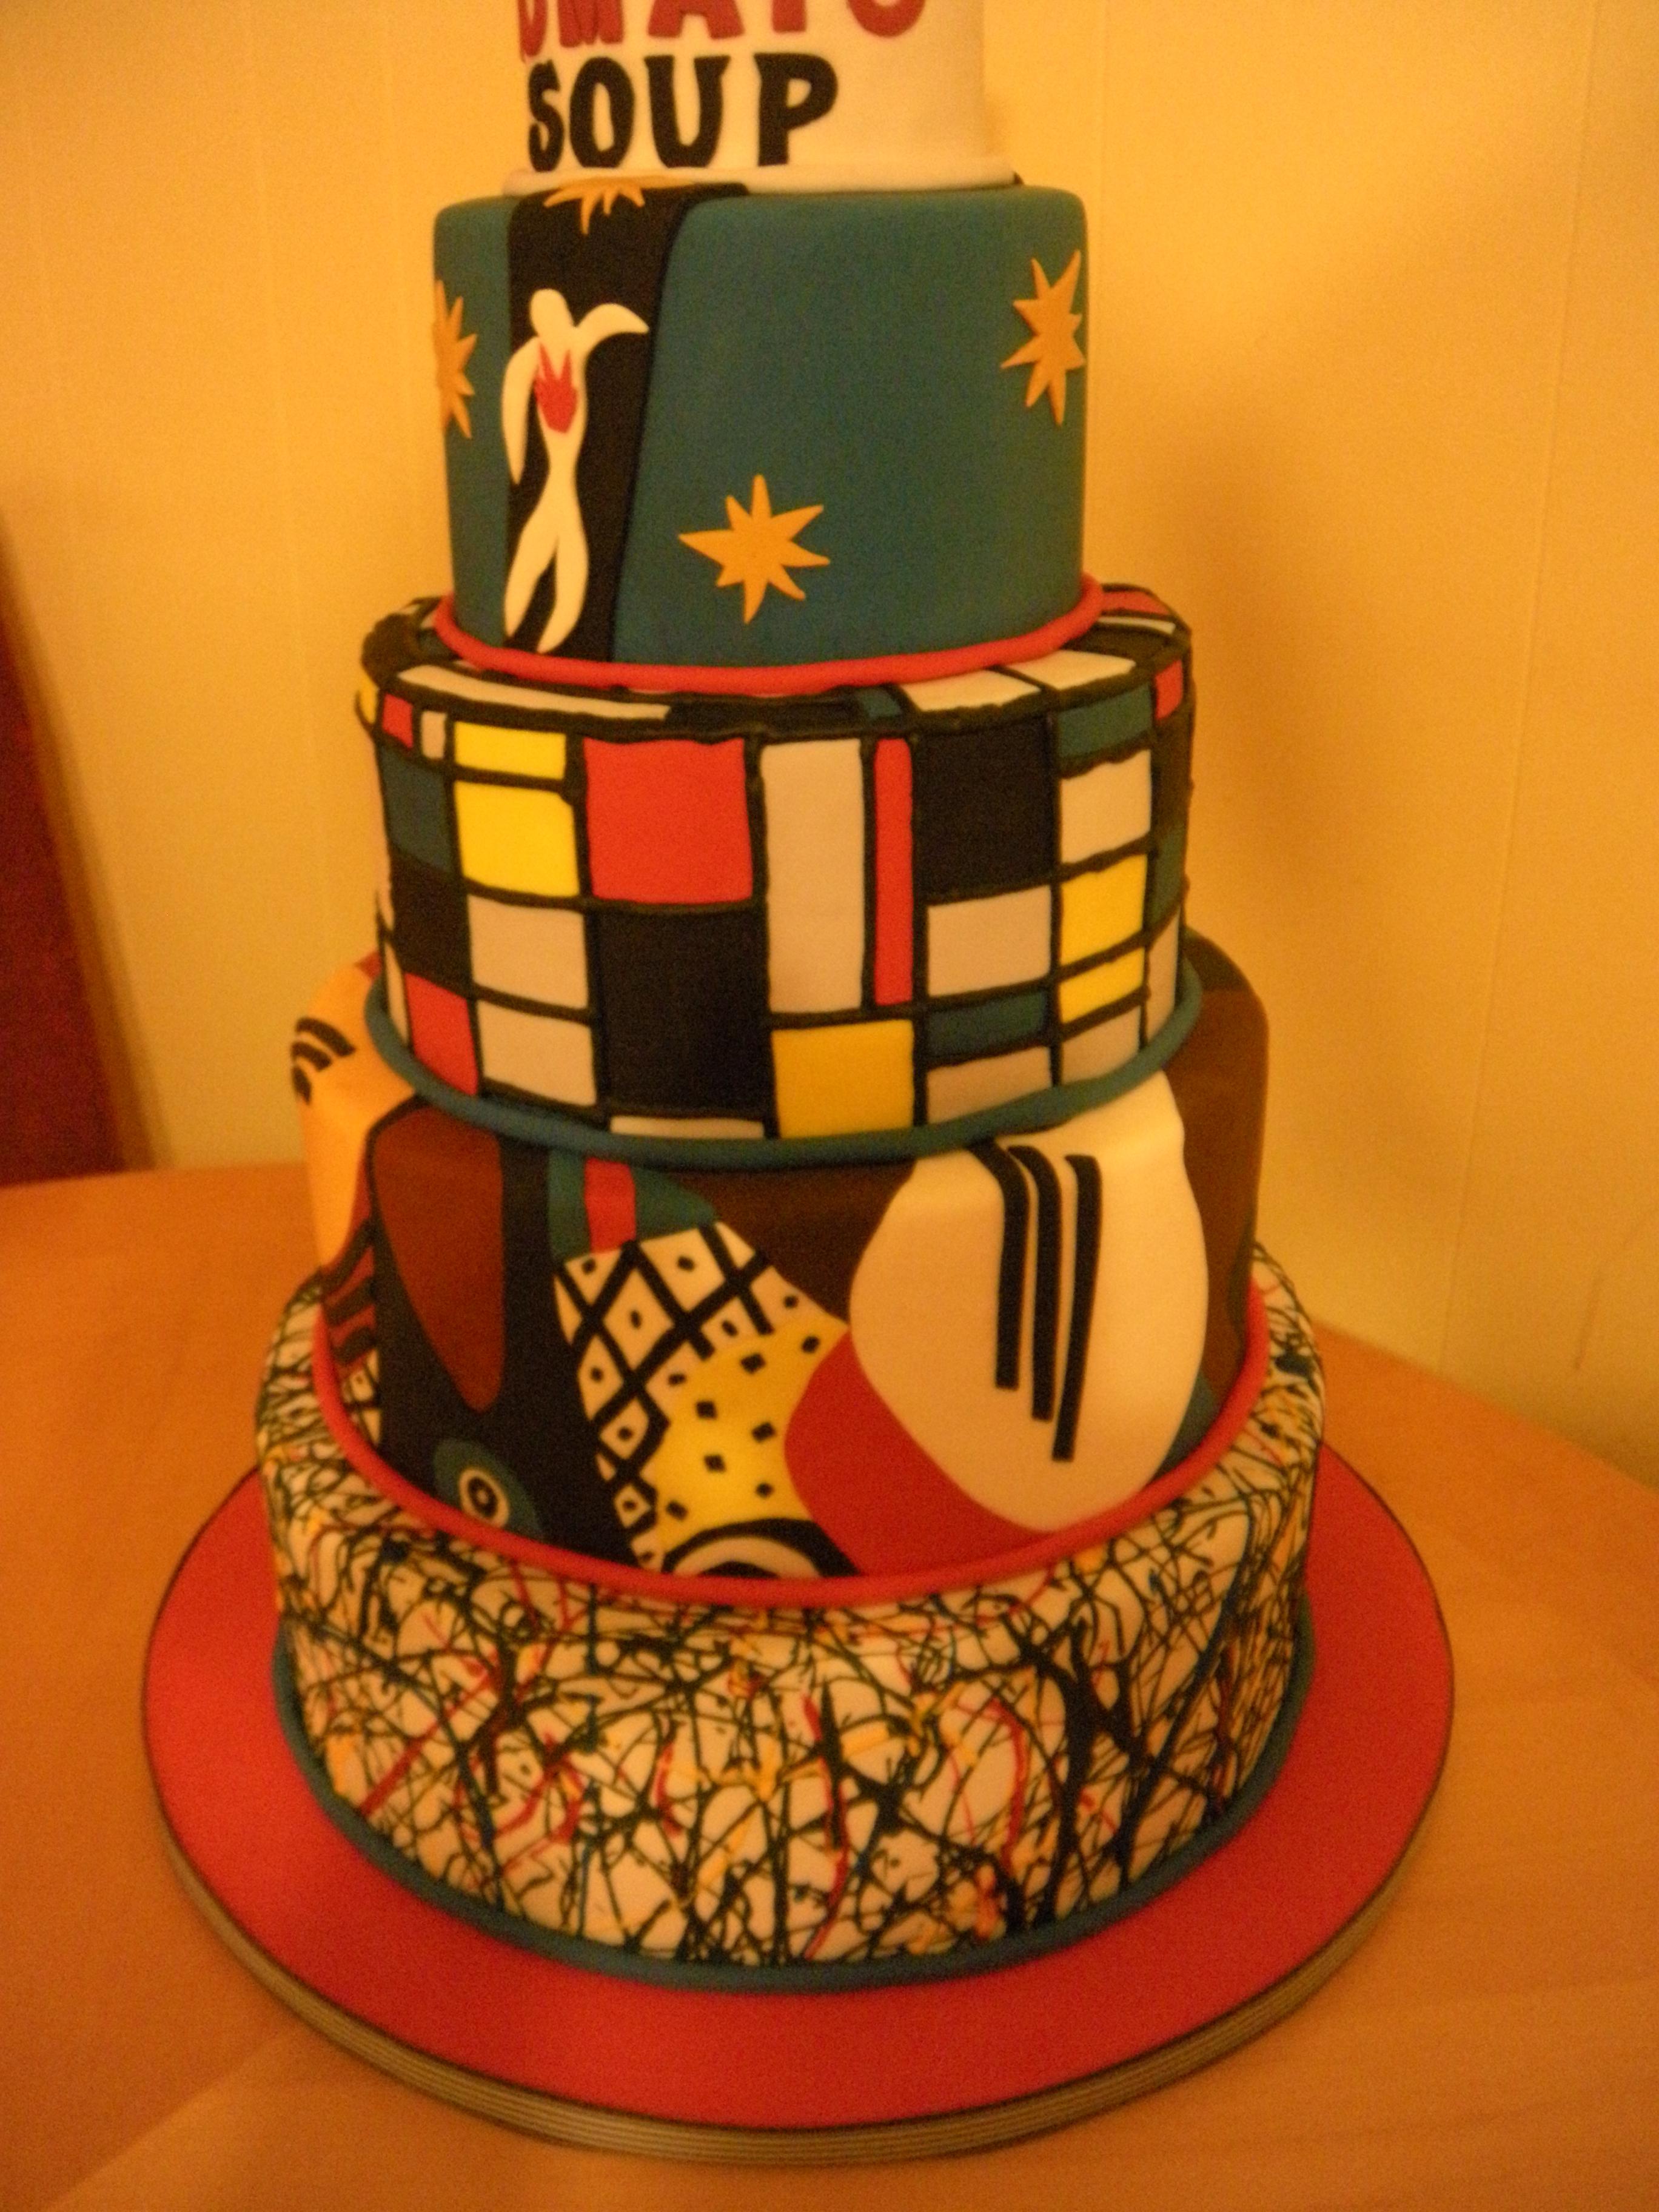 Artsy Fartsy Cake Inspired By Pollock Picasso Mondrian